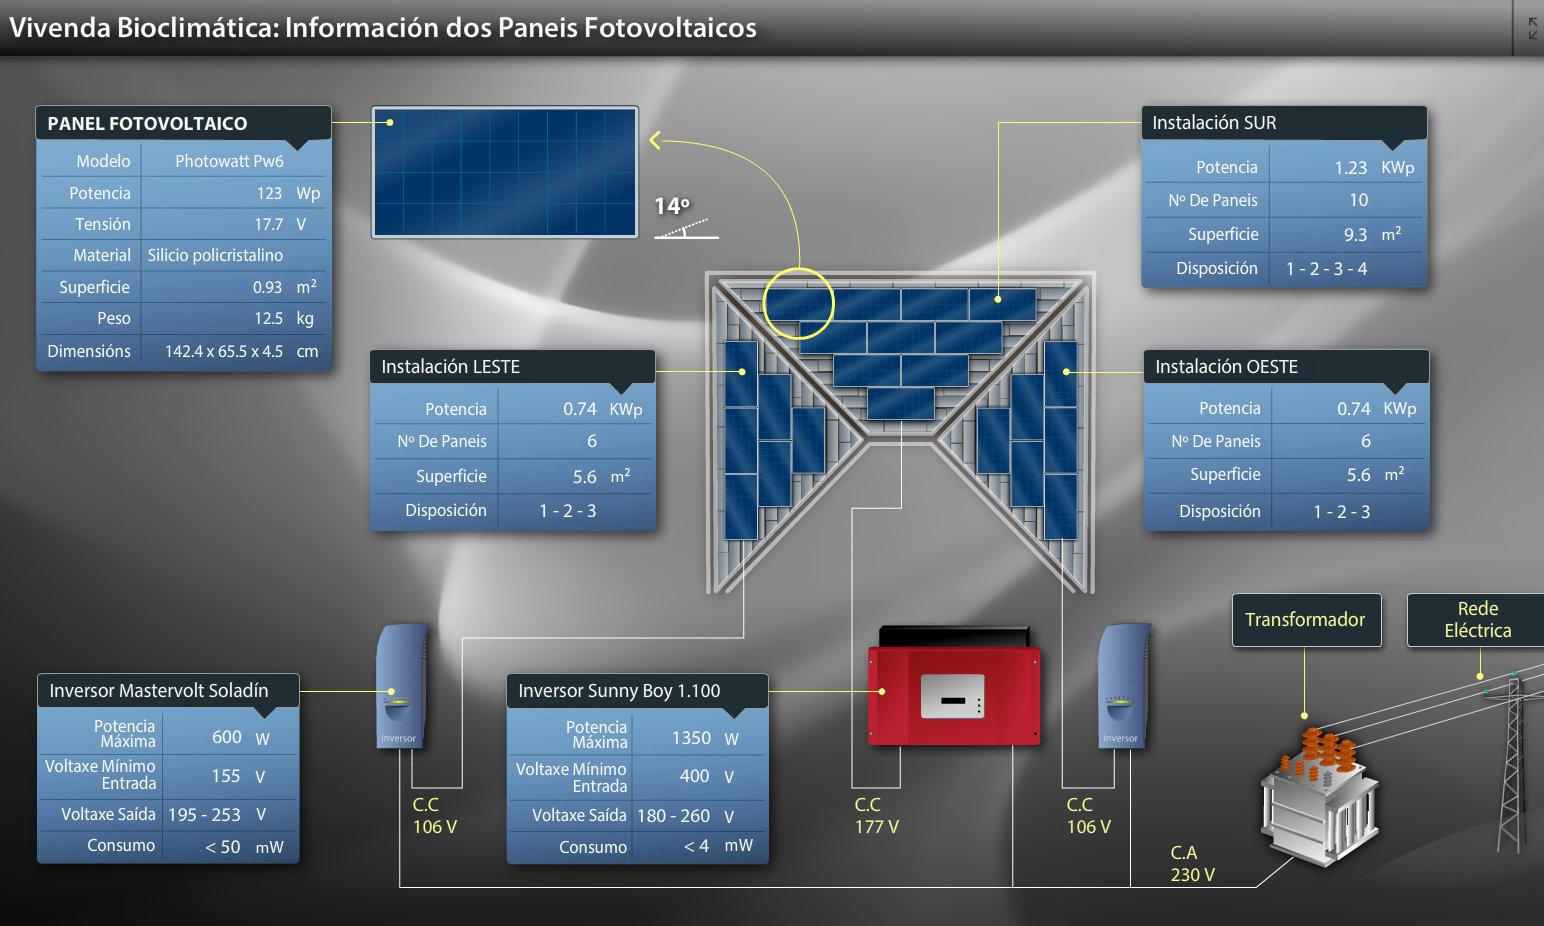 Paneles fotovoltaicos de la vivienda bioclimática